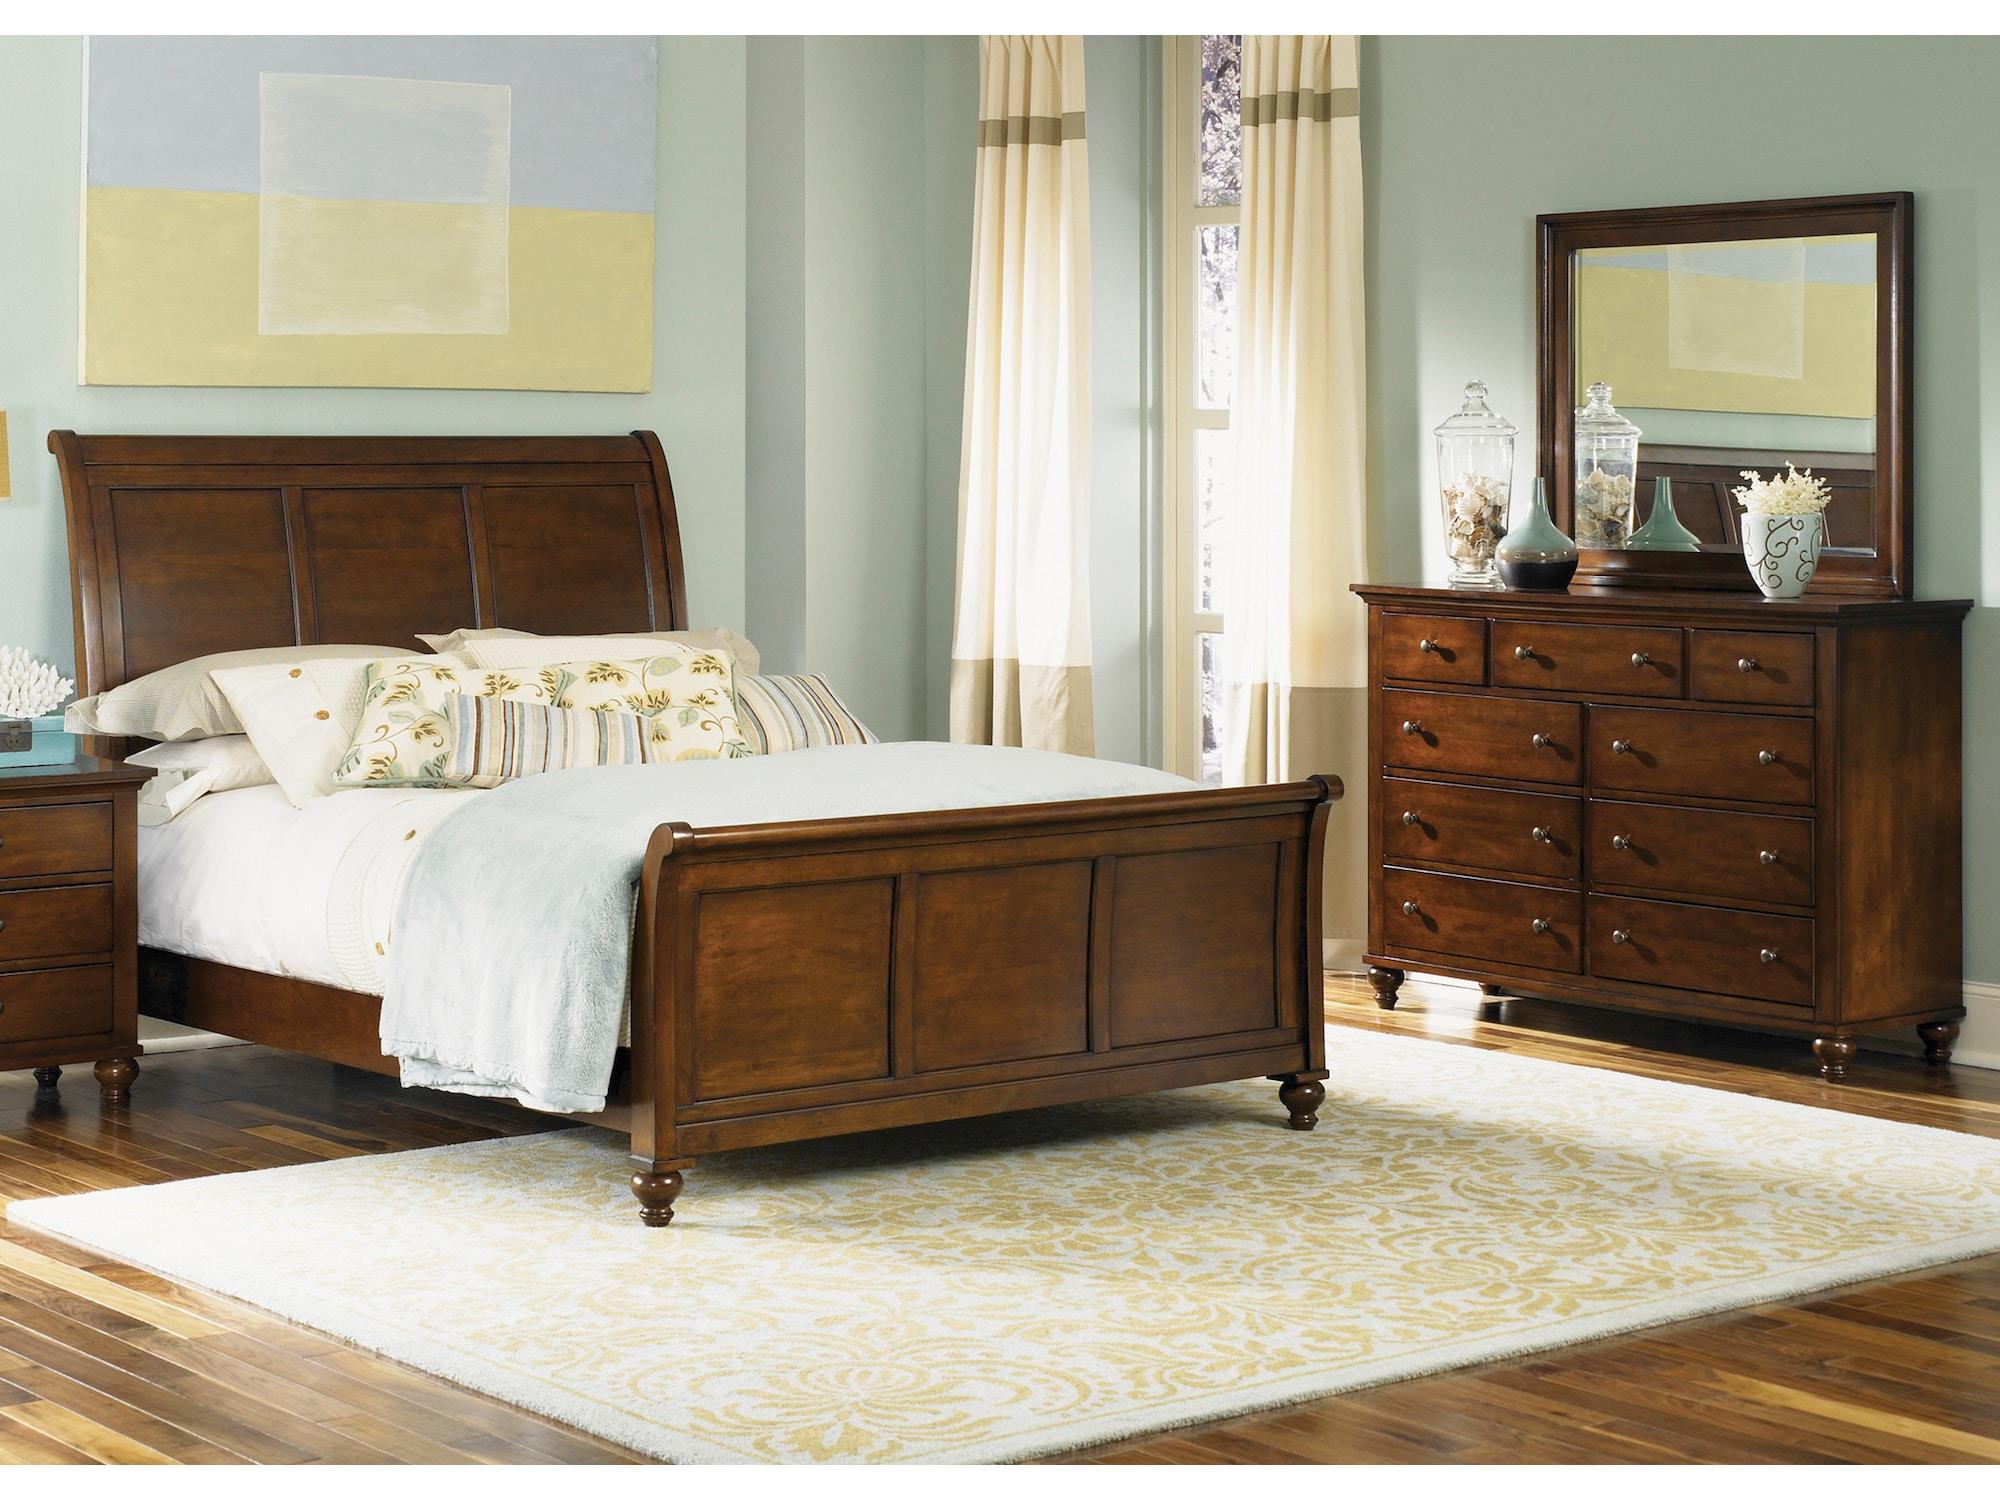 Liberty Furniture Master Bedroom Sets - Furniture Fair - Cincinnati ...